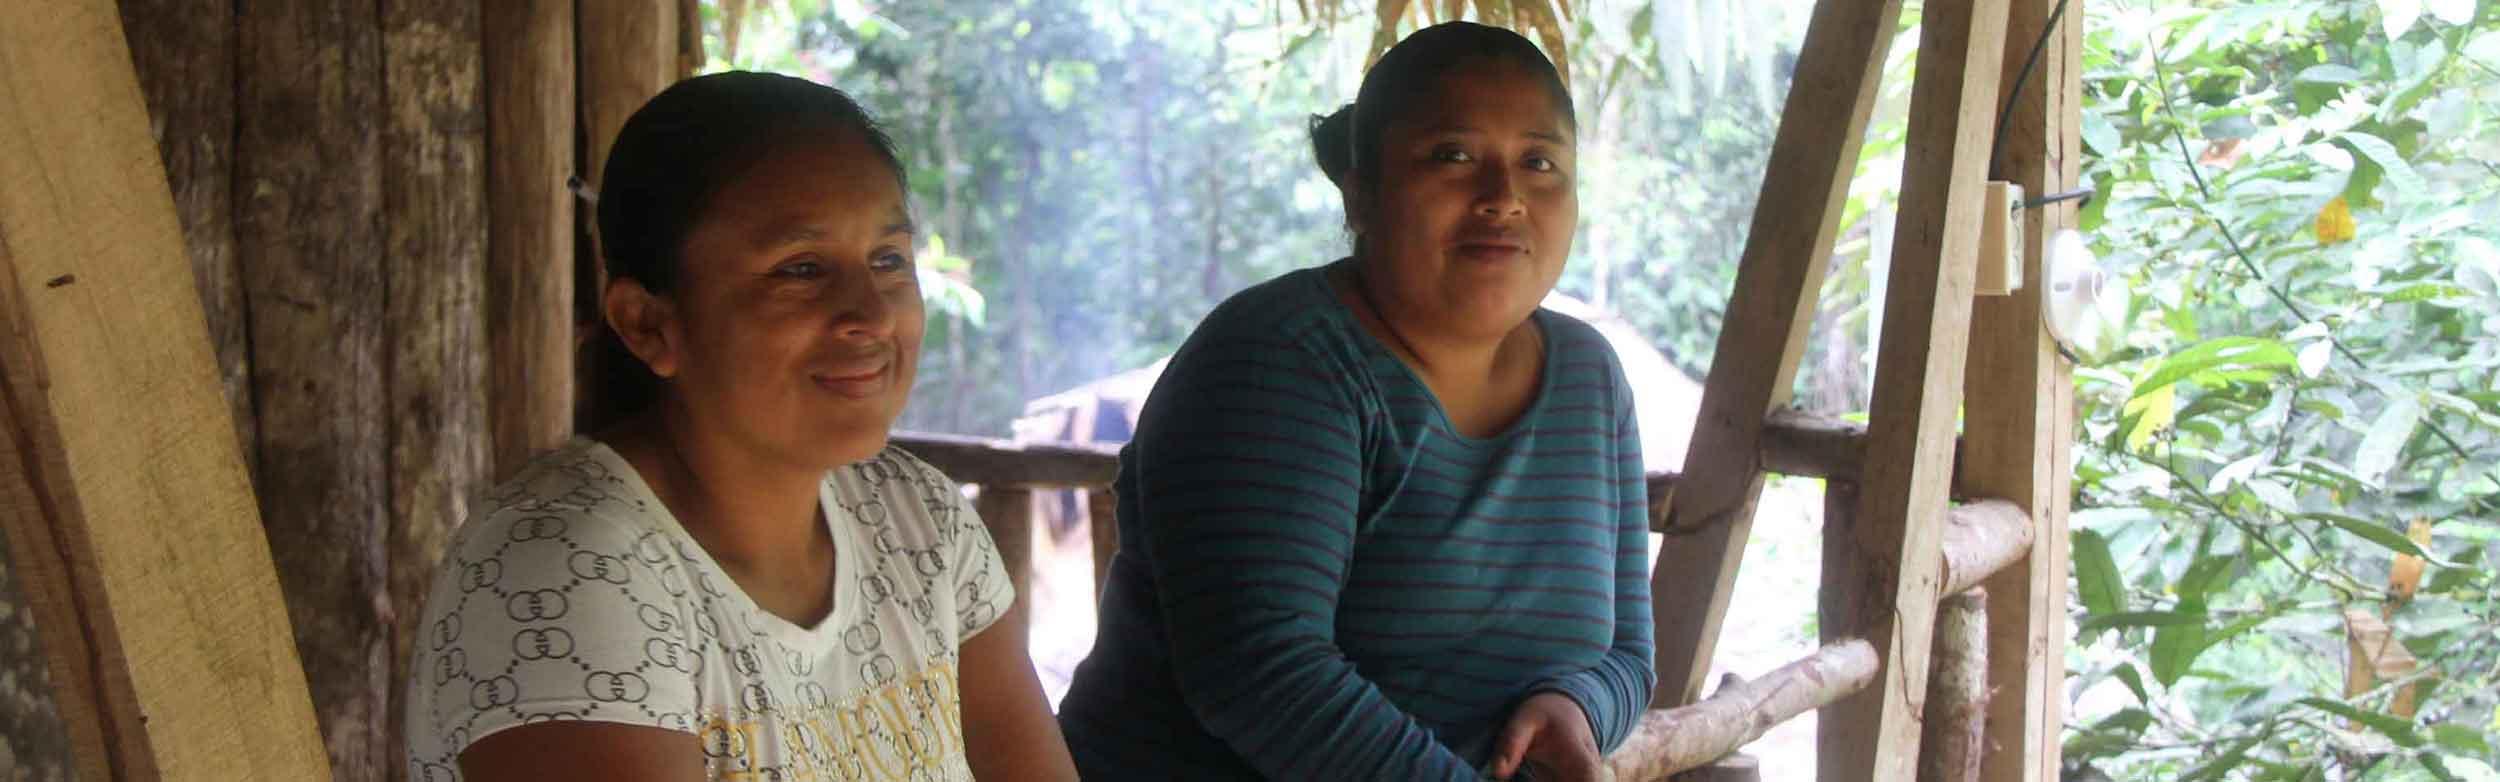 Oreba Chocolate Farm Tour + Indigenous Villa